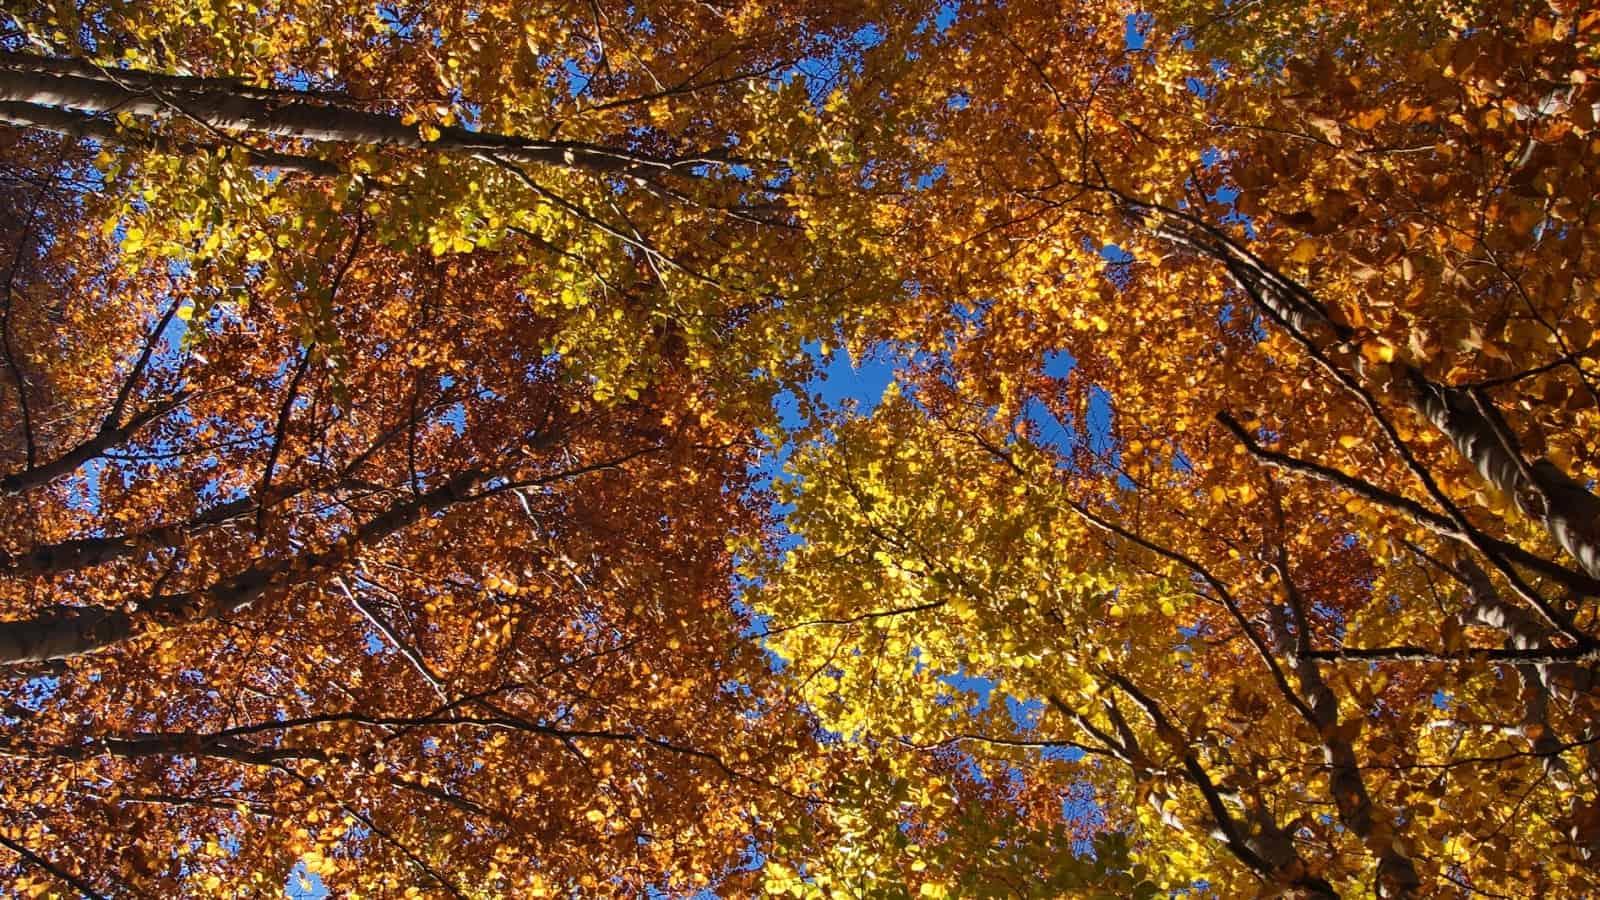 Colouring of the leaves in the fall season - photo: Vrachanski Balkan Nature Park